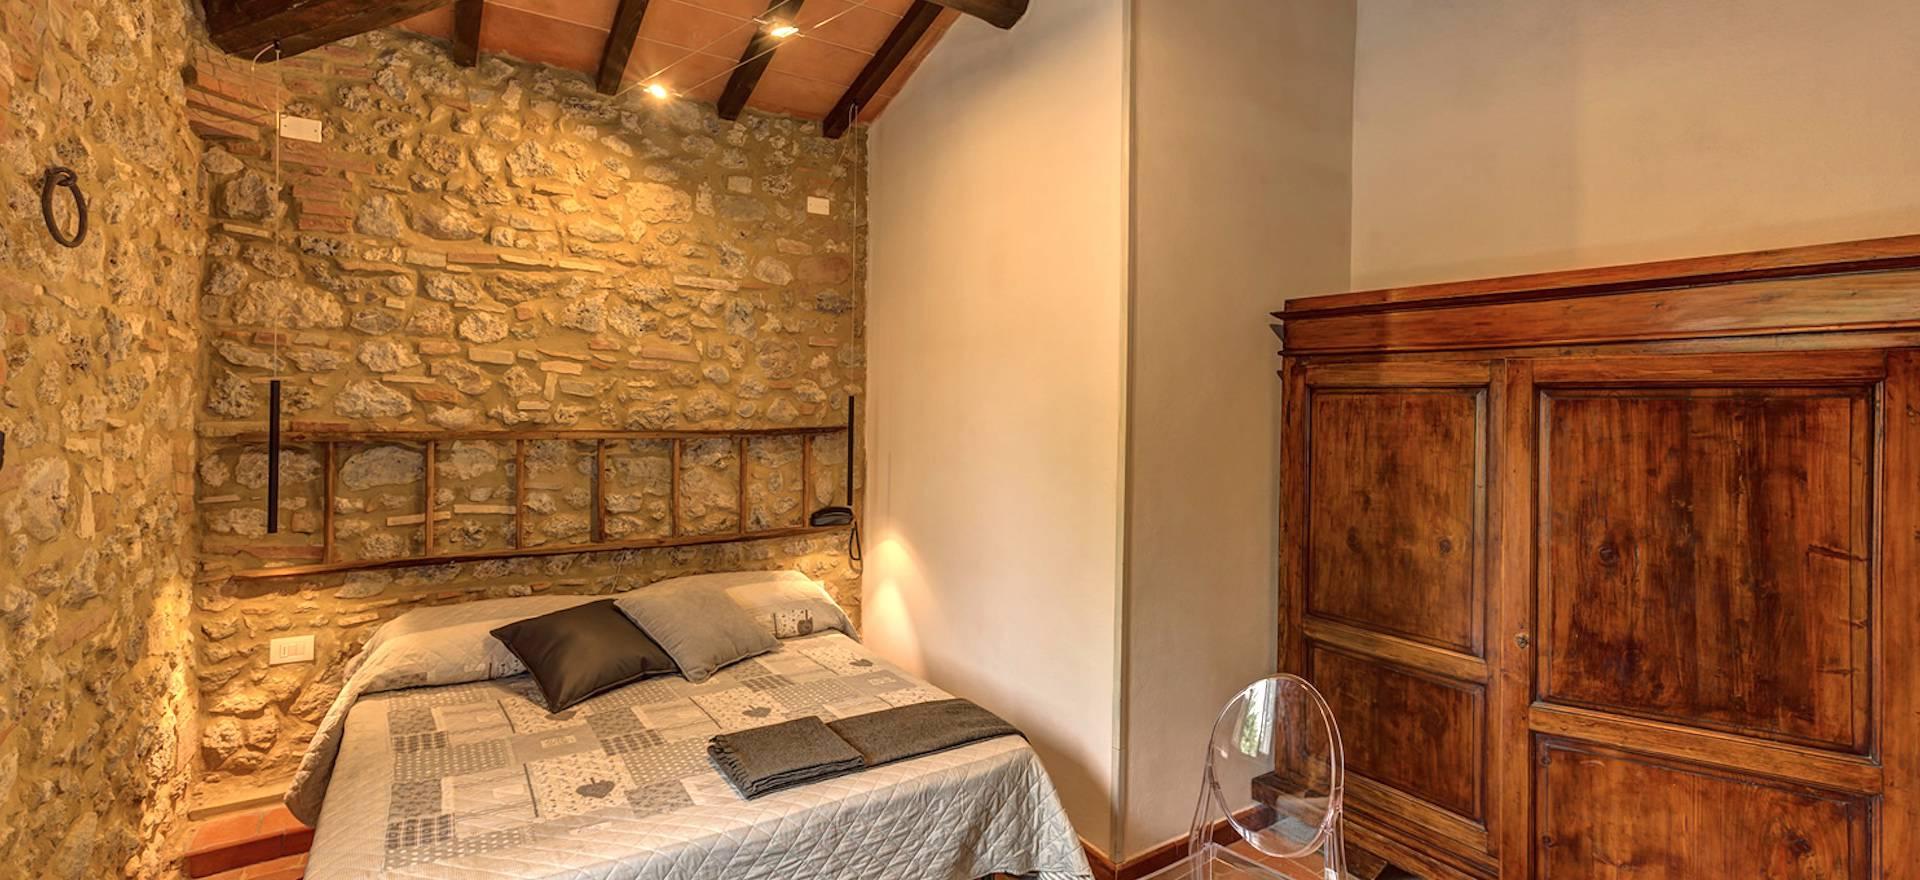 Agriturismo met restaurant bij San Gimignano, Toscane